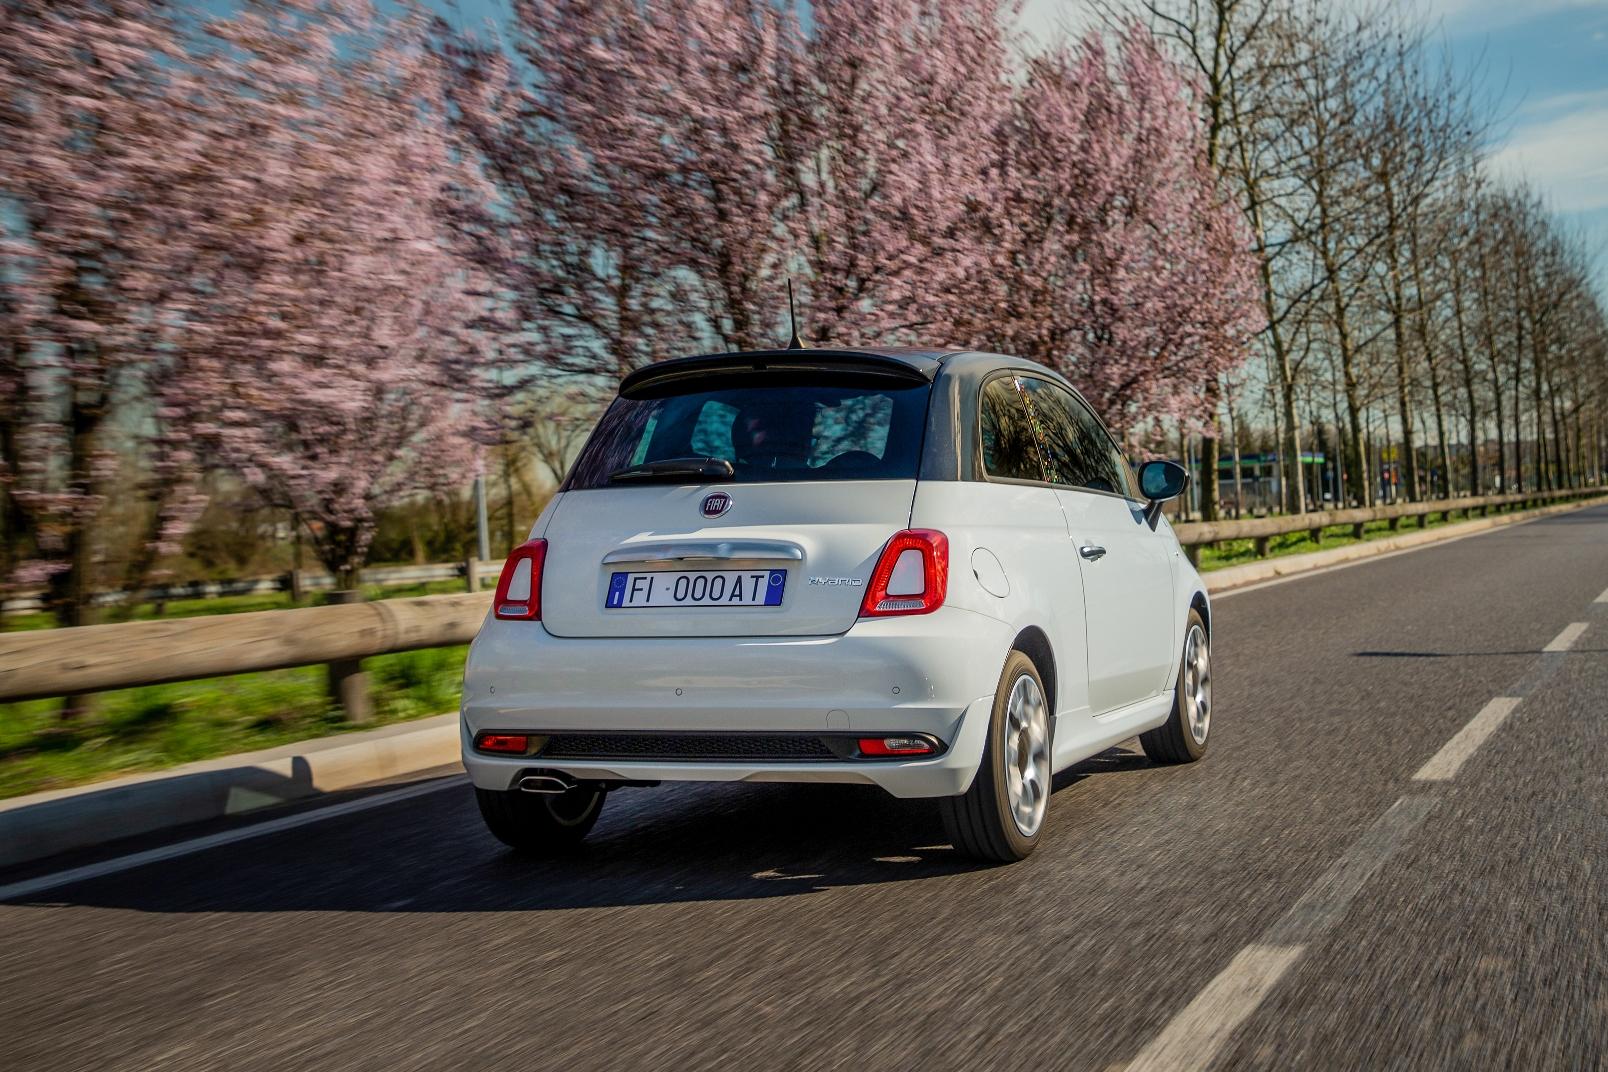 Fiat 500 Hey Google (4)